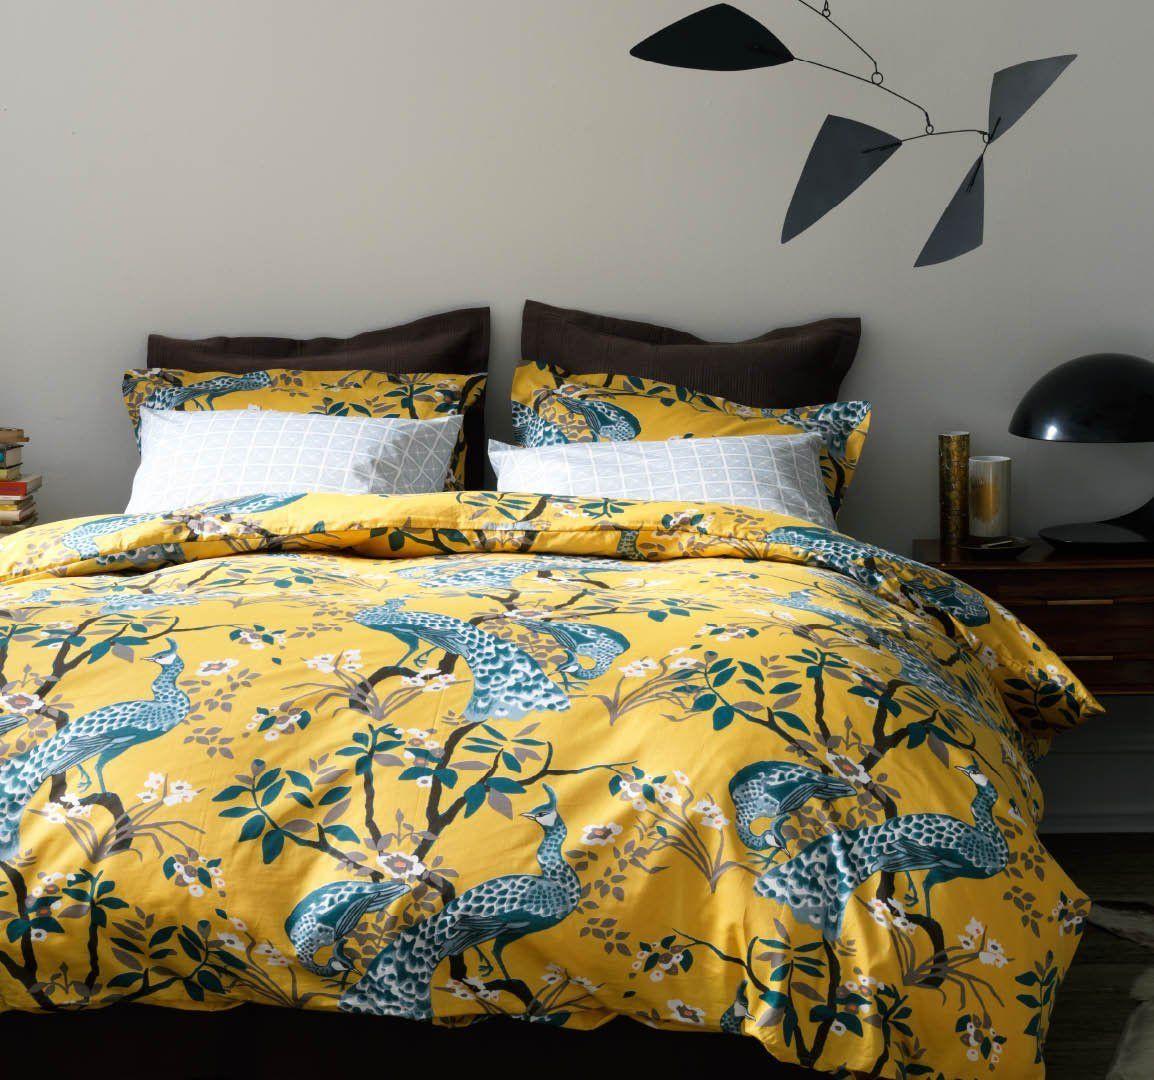 dwellstudio peacock duvet set yellow and peacock blue bedding  - dwellstudio peacock duvet set yellow and peacock blue bedding